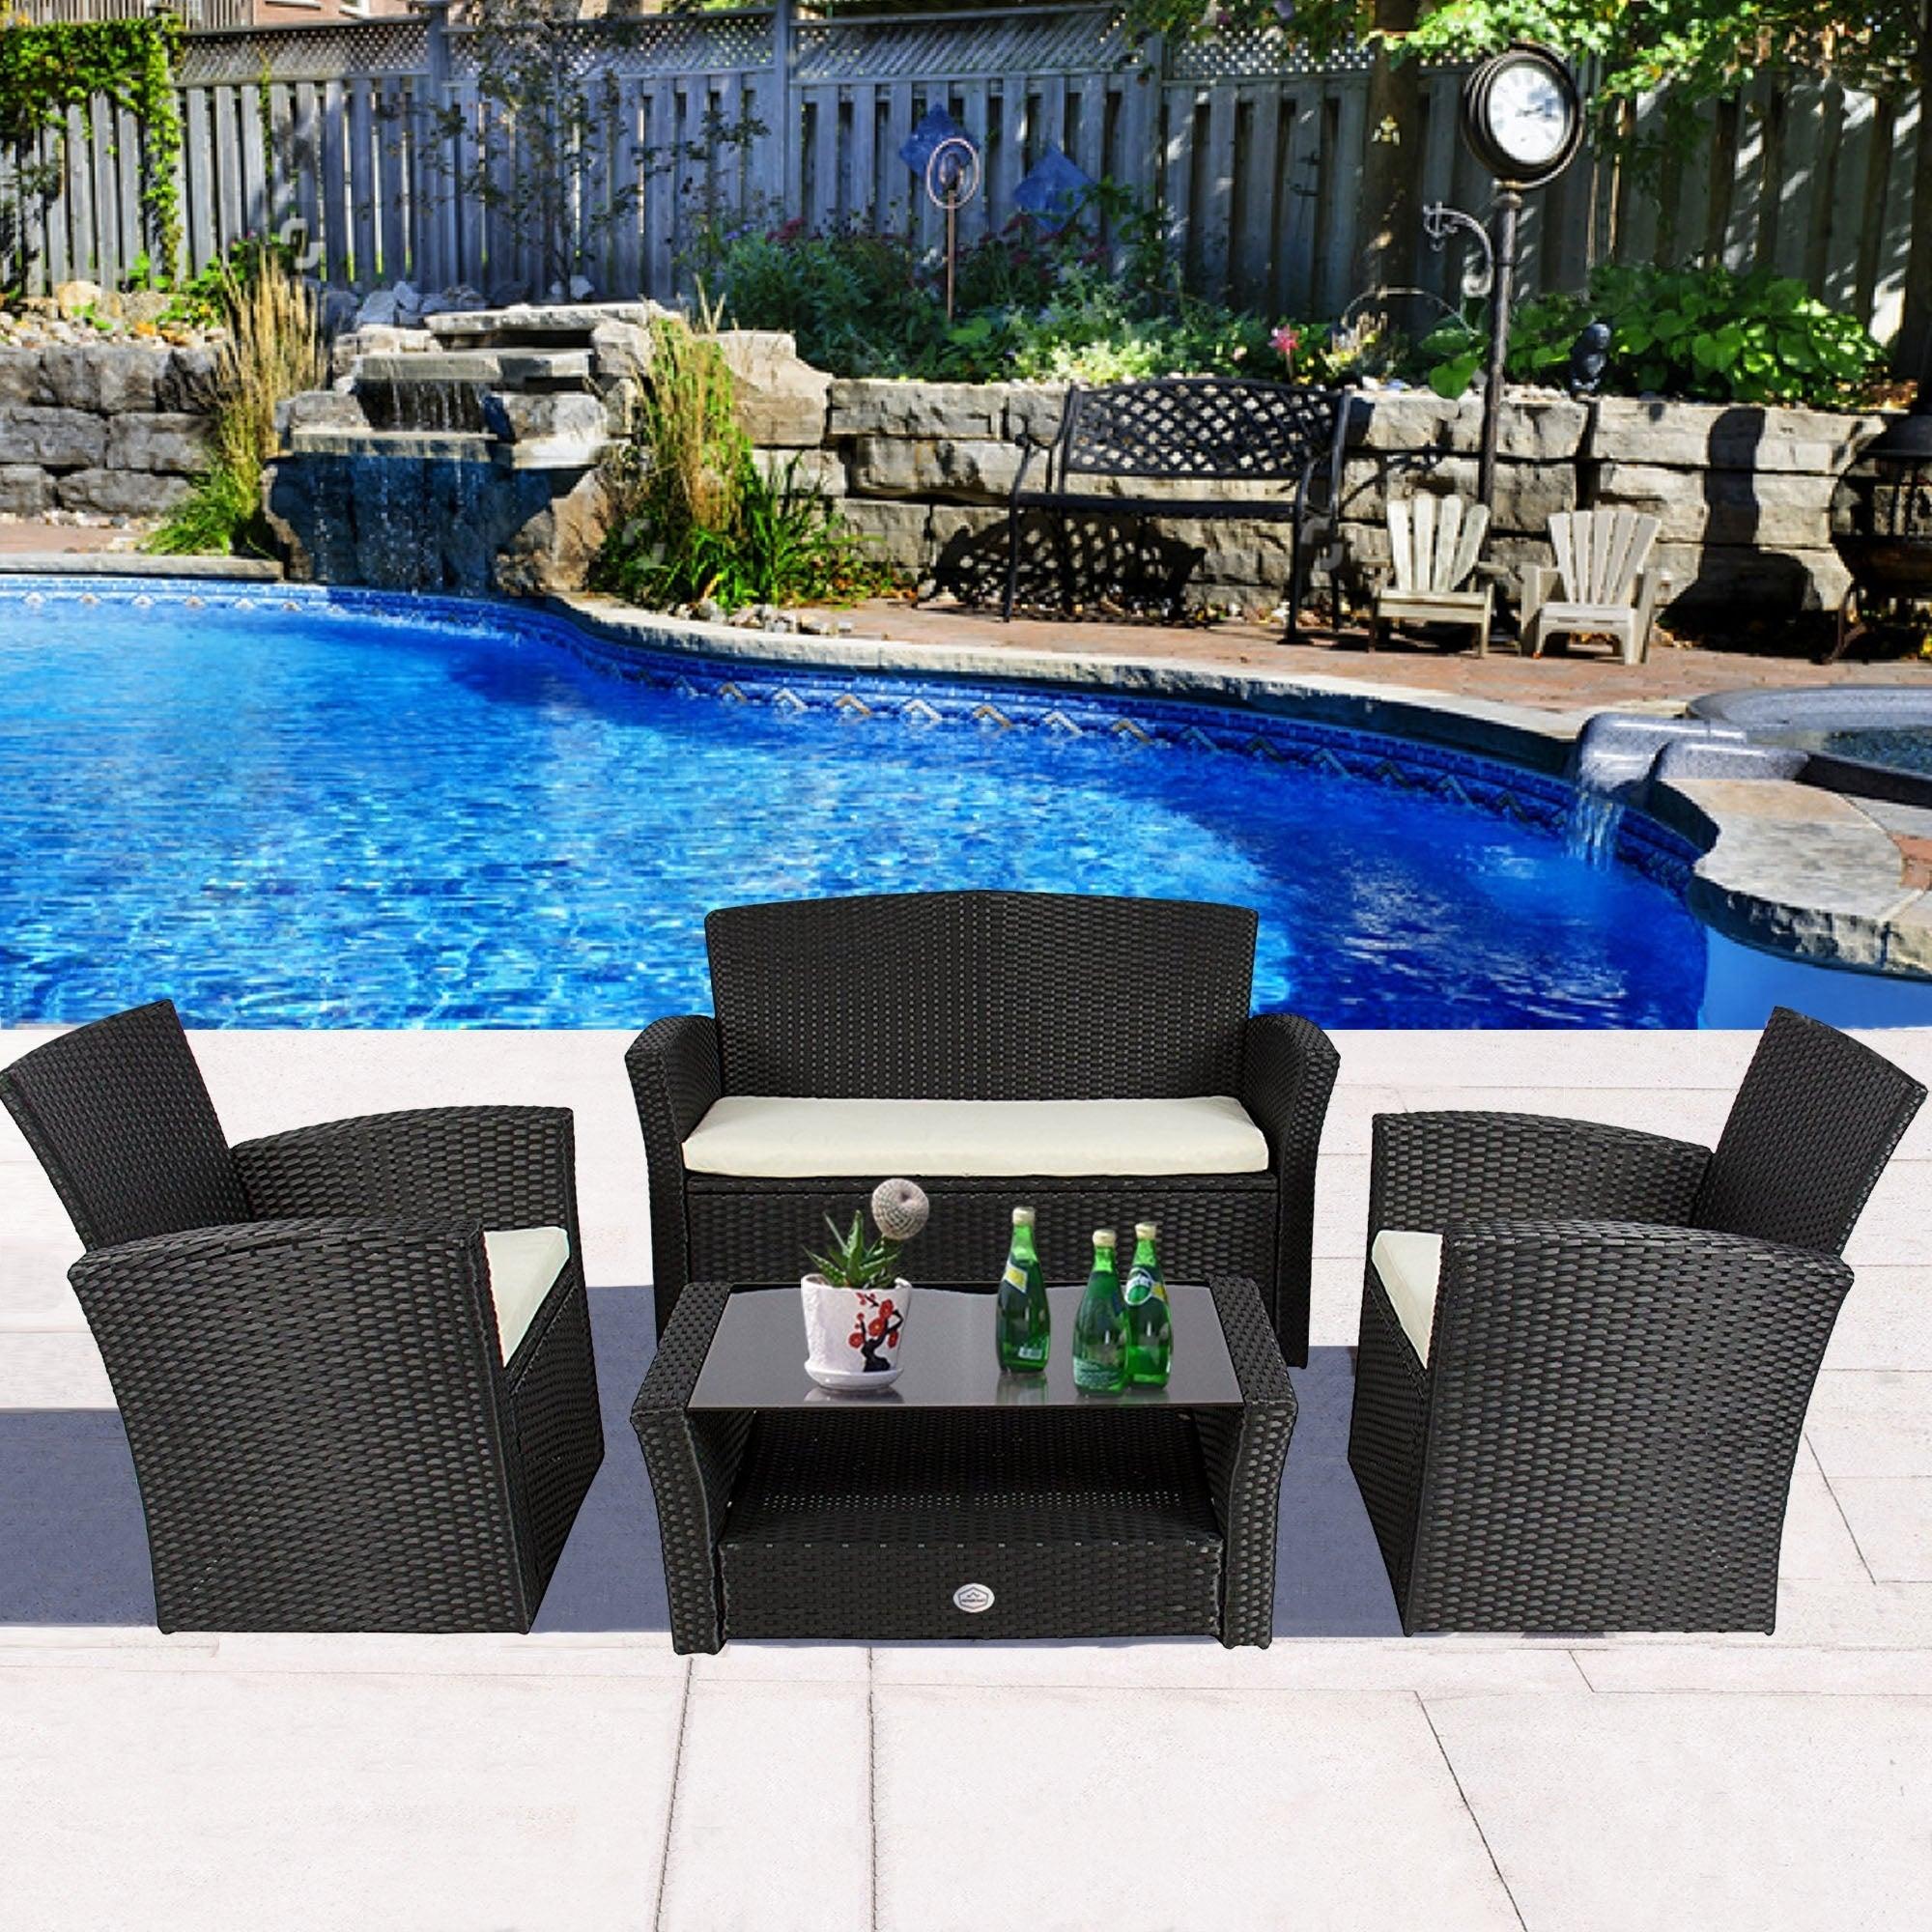 Shop 4 Piece Outdoor Patio Furniture Sets Wicker Outdoor Furniture